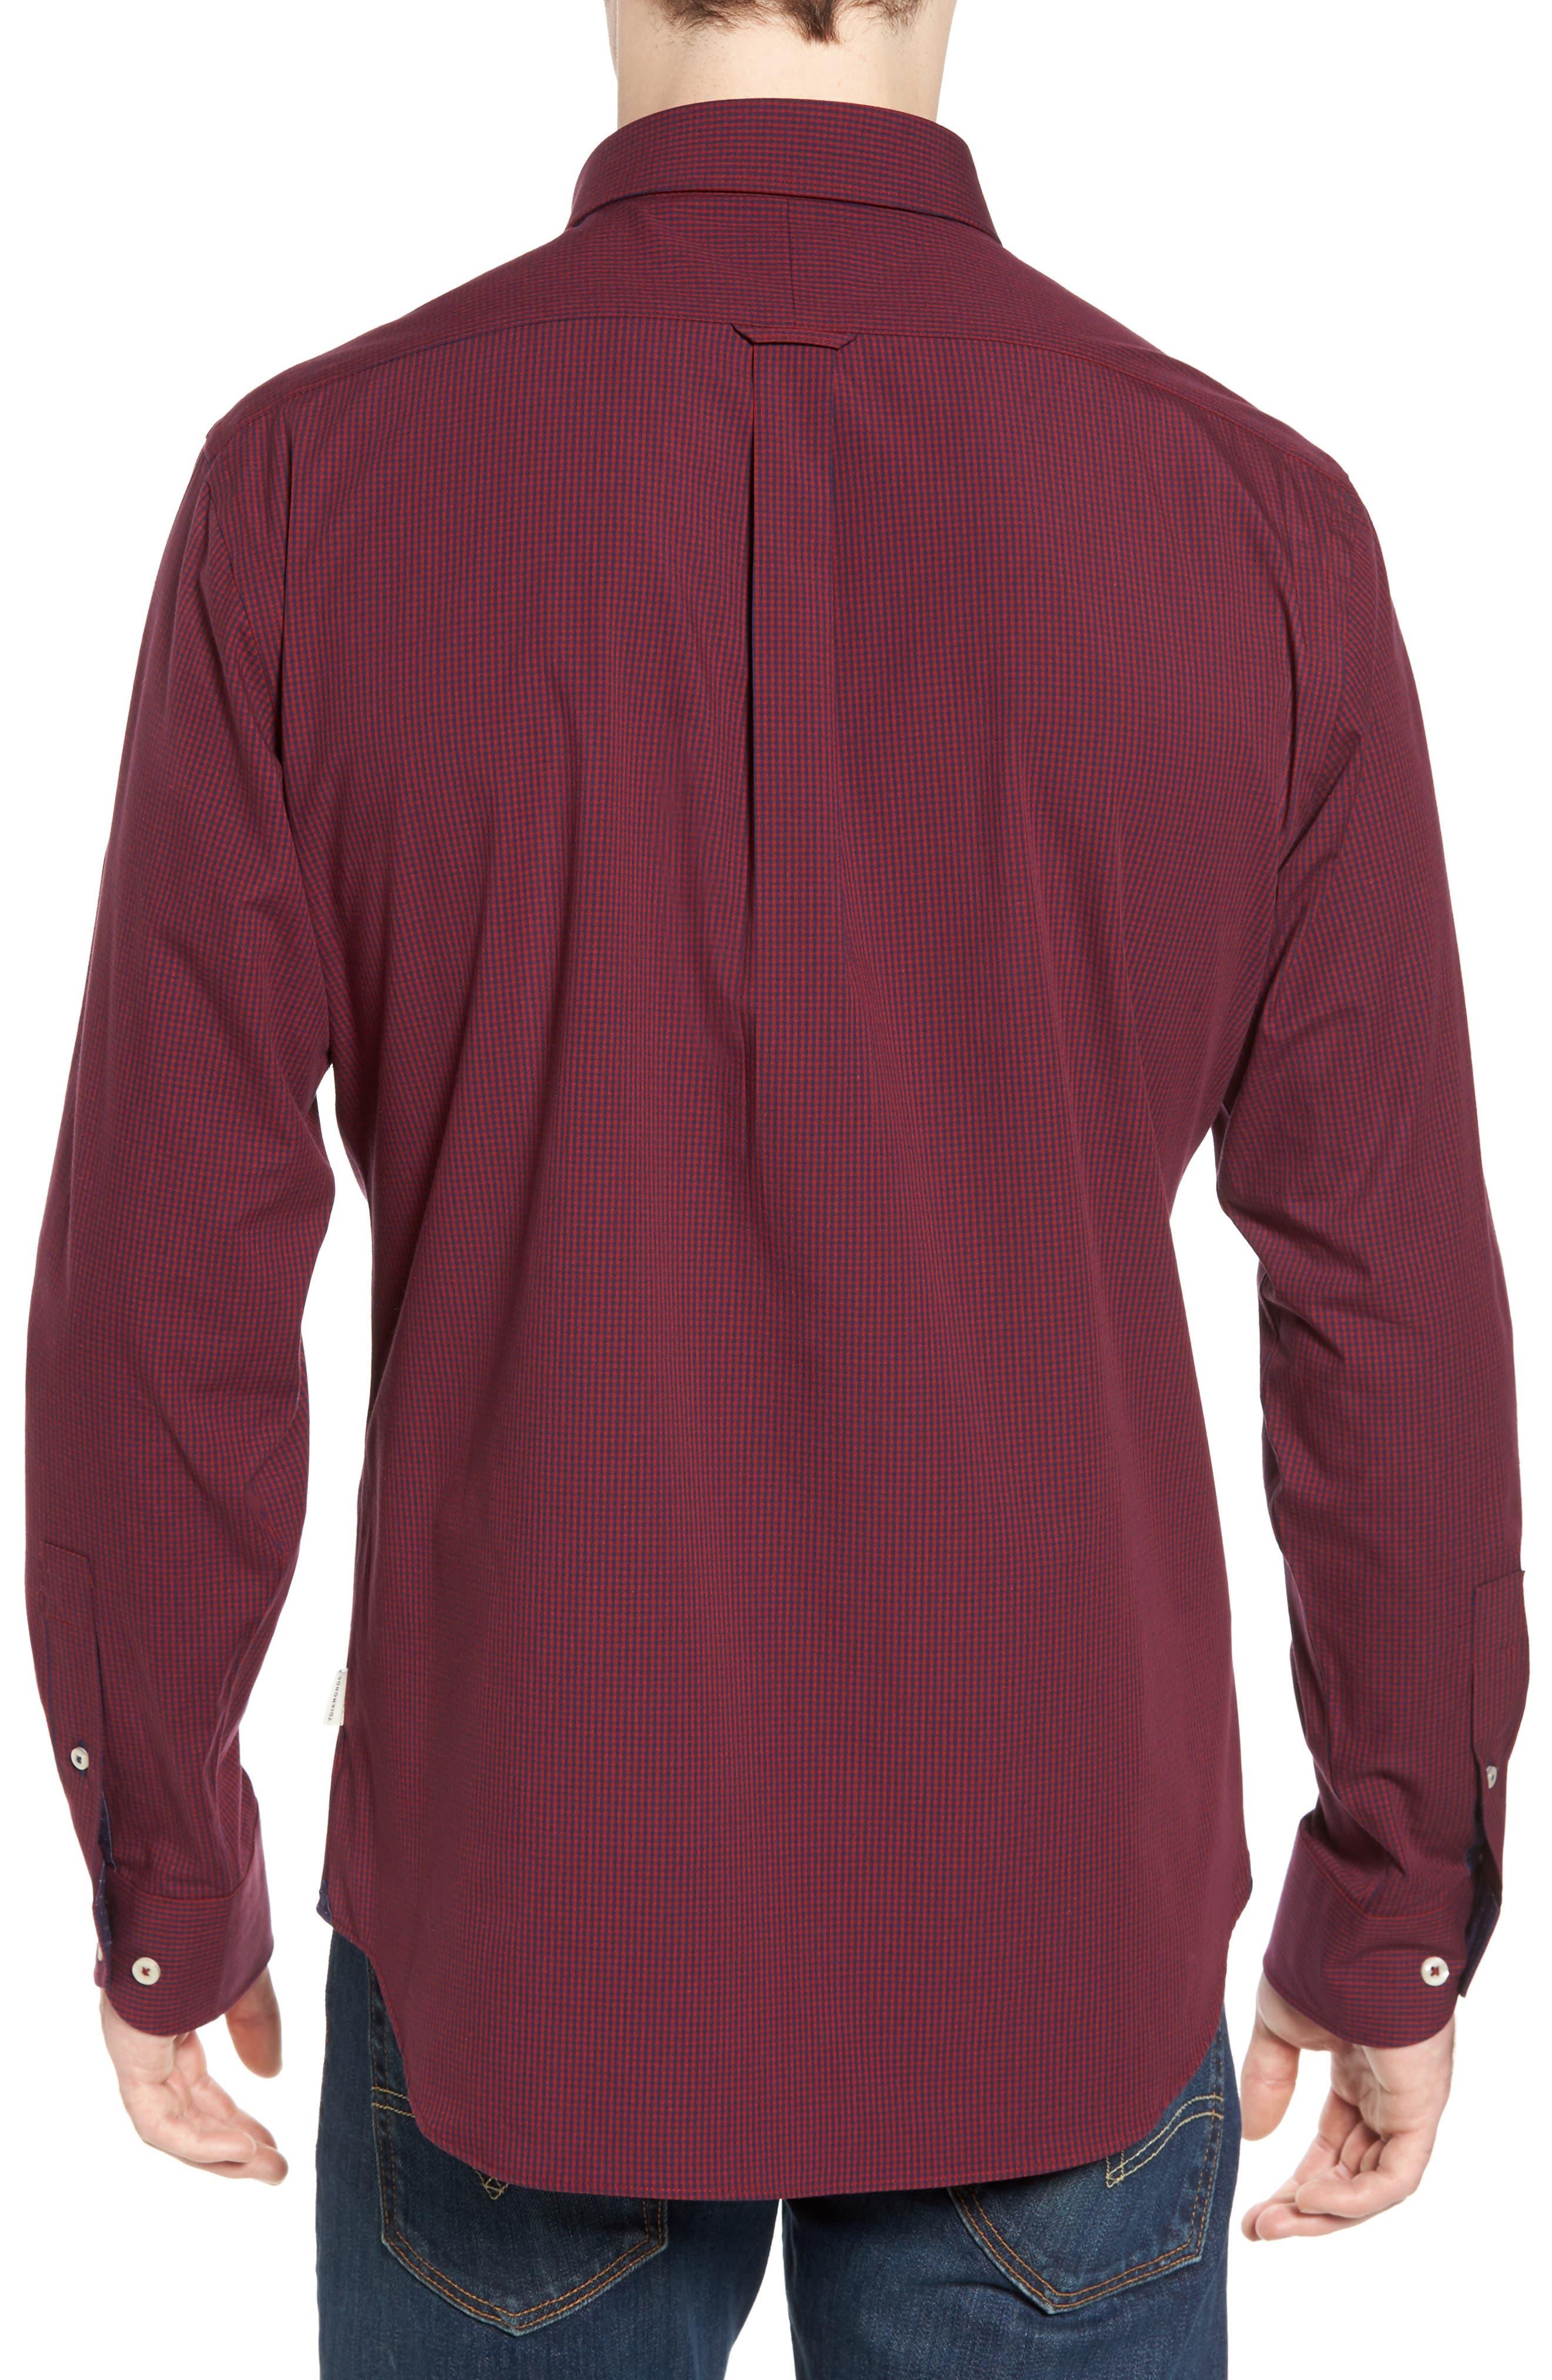 Oracle Woven Shirt,                             Alternate thumbnail 2, color,                             600